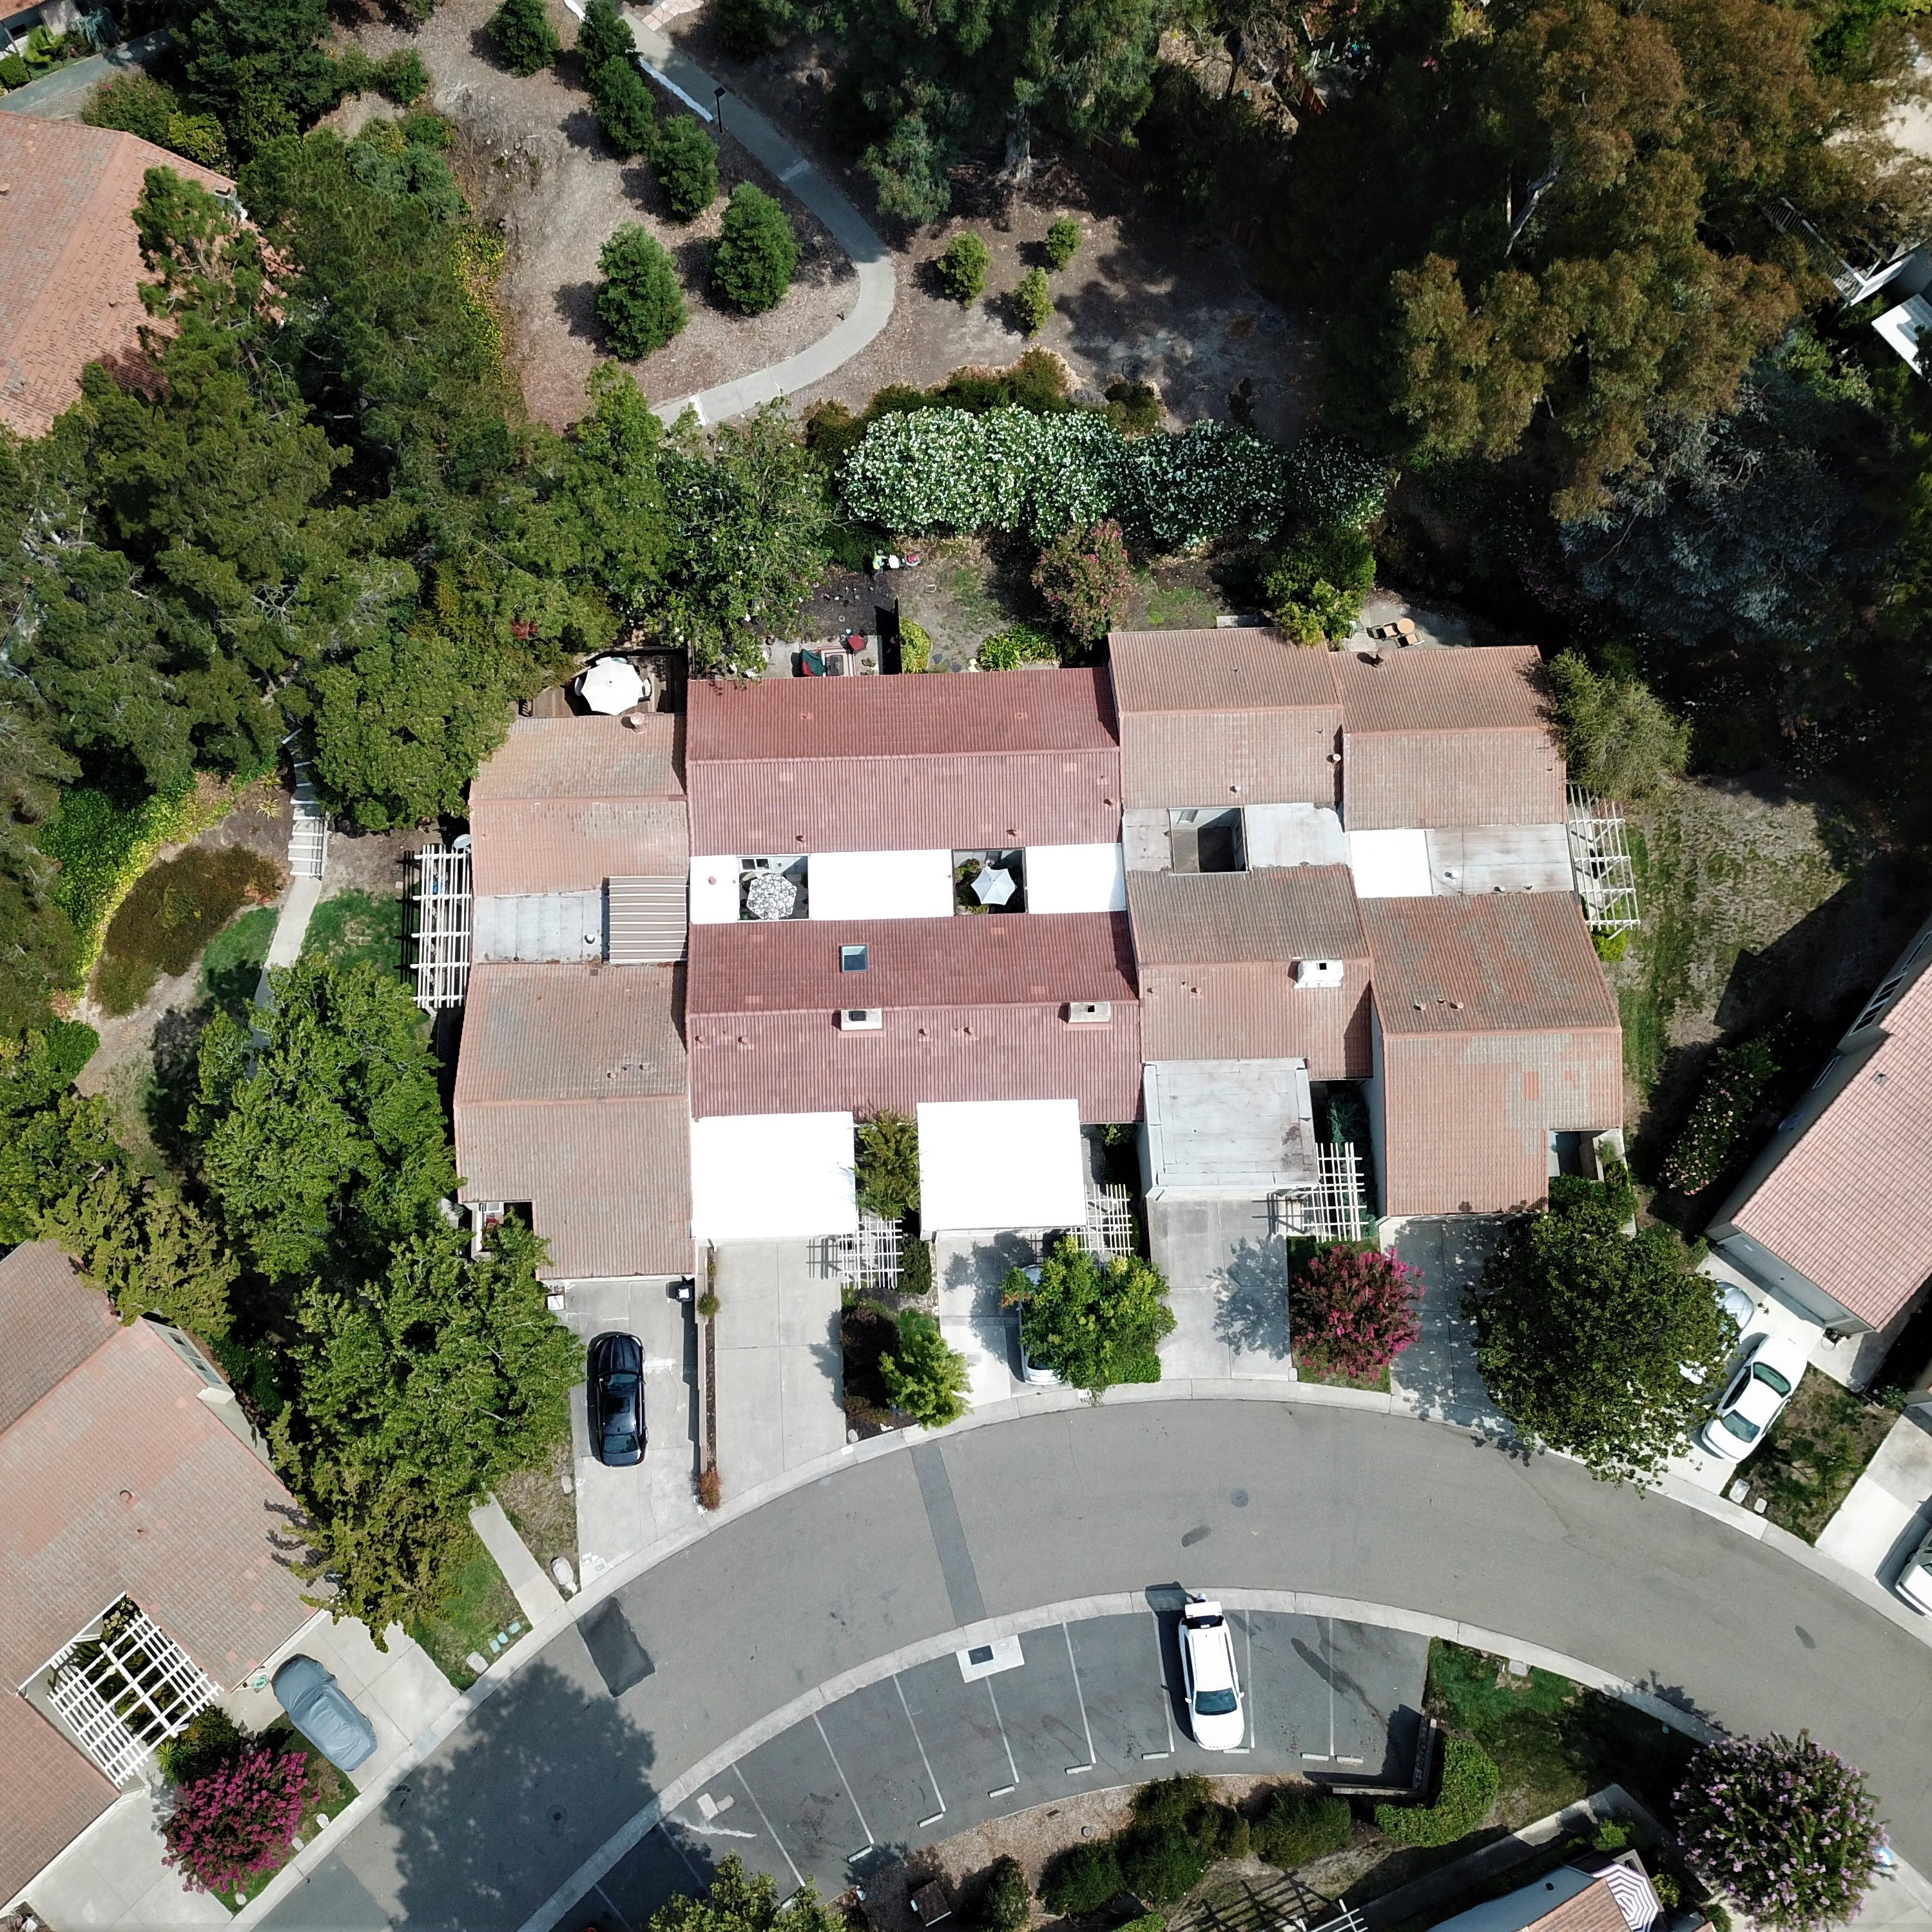 Copper Canyon Apartments: PRI Premiere Roofing Inc